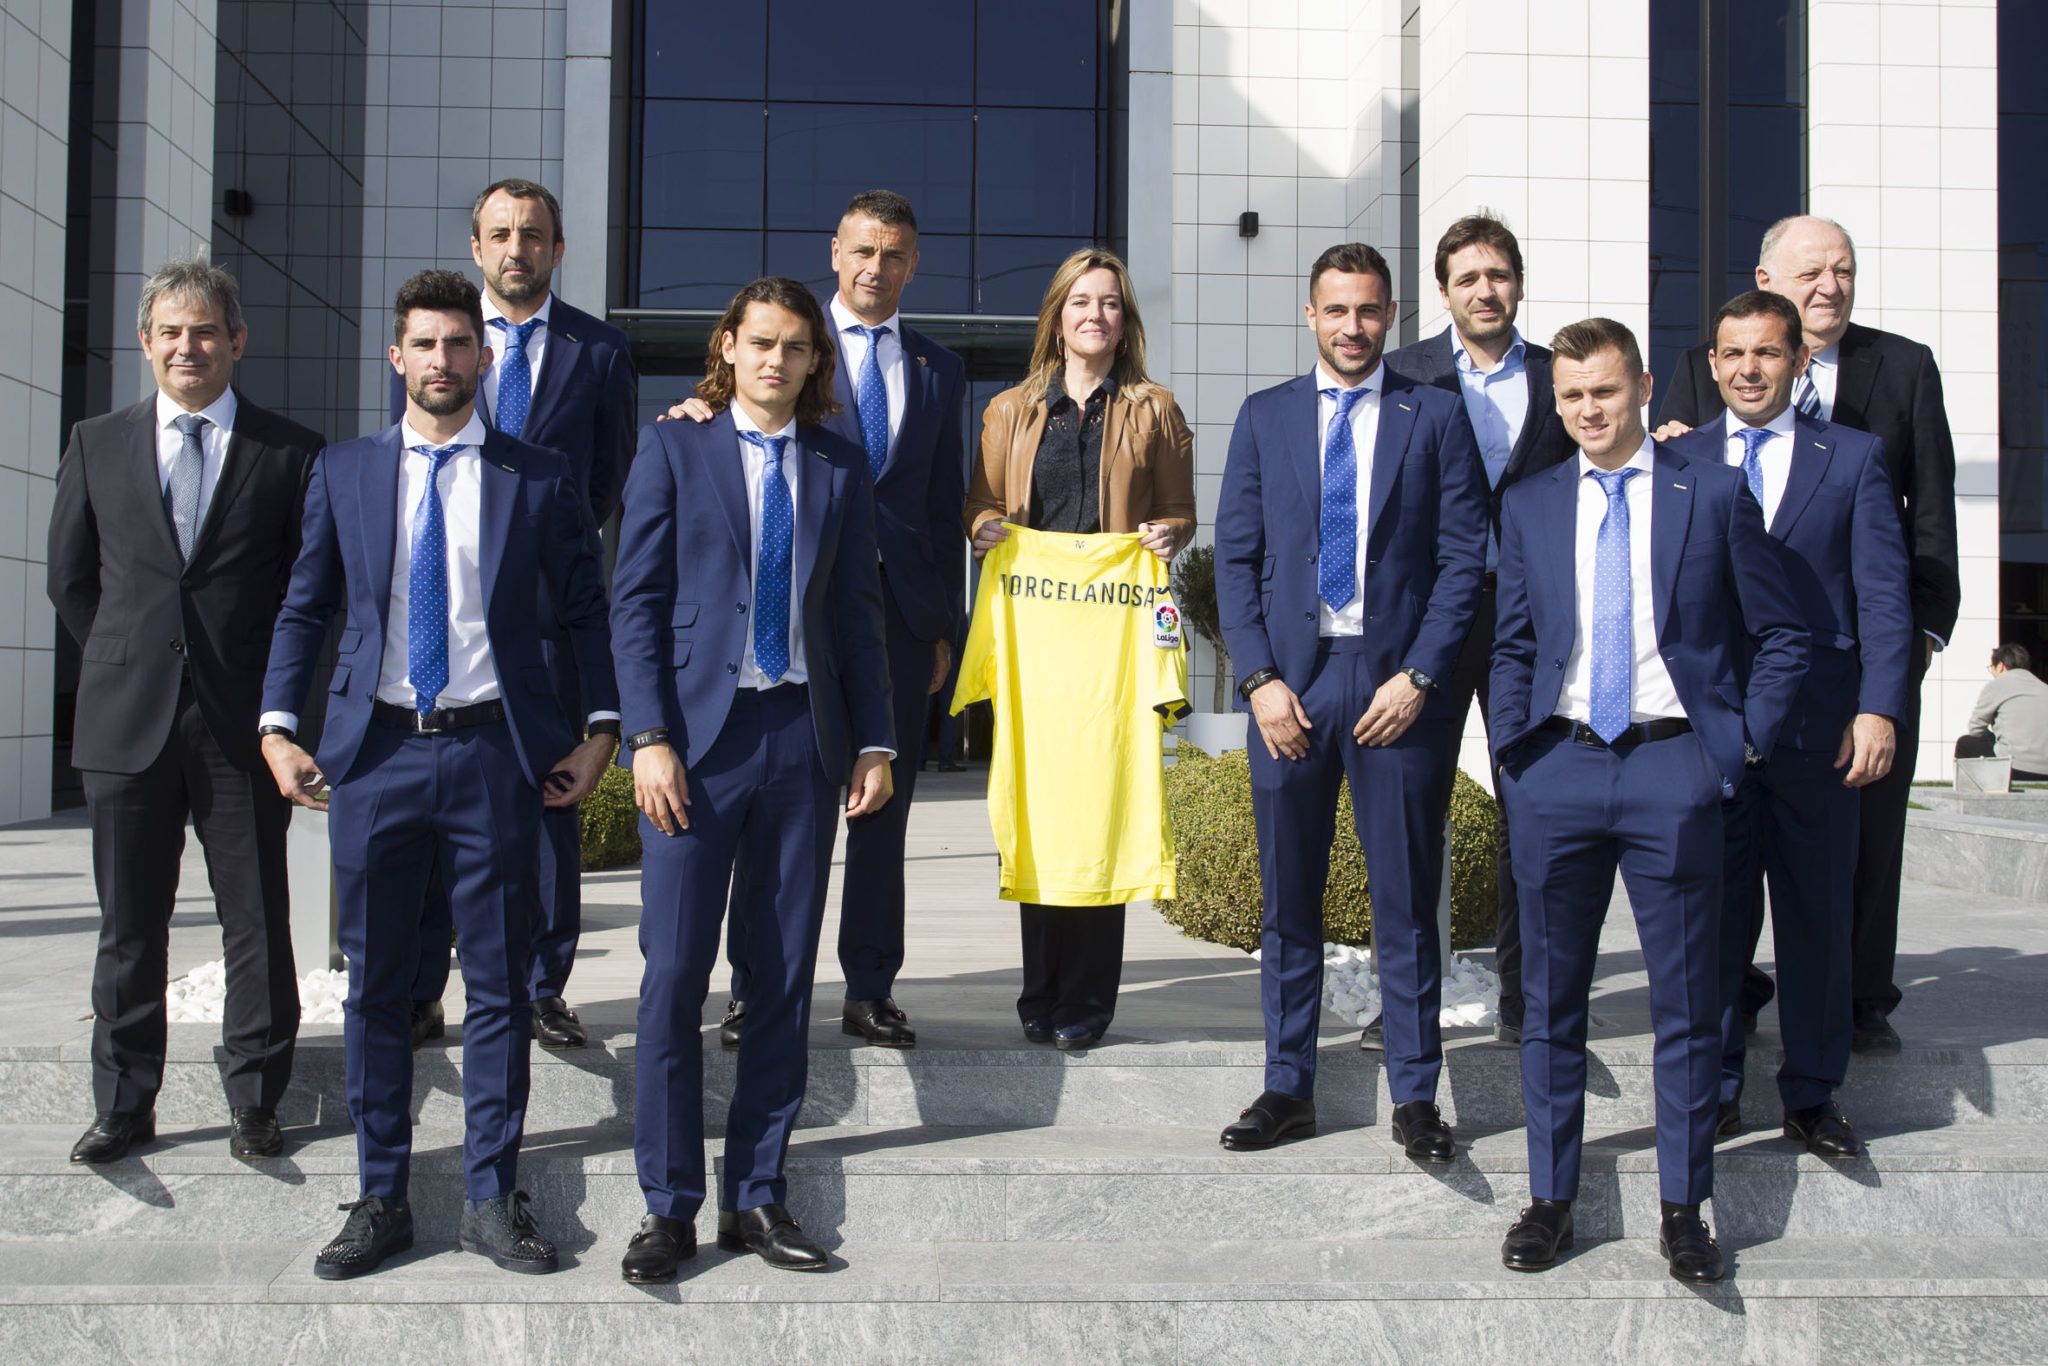 MEDIOS1 - El Villarreal CF visita Porcelanosa